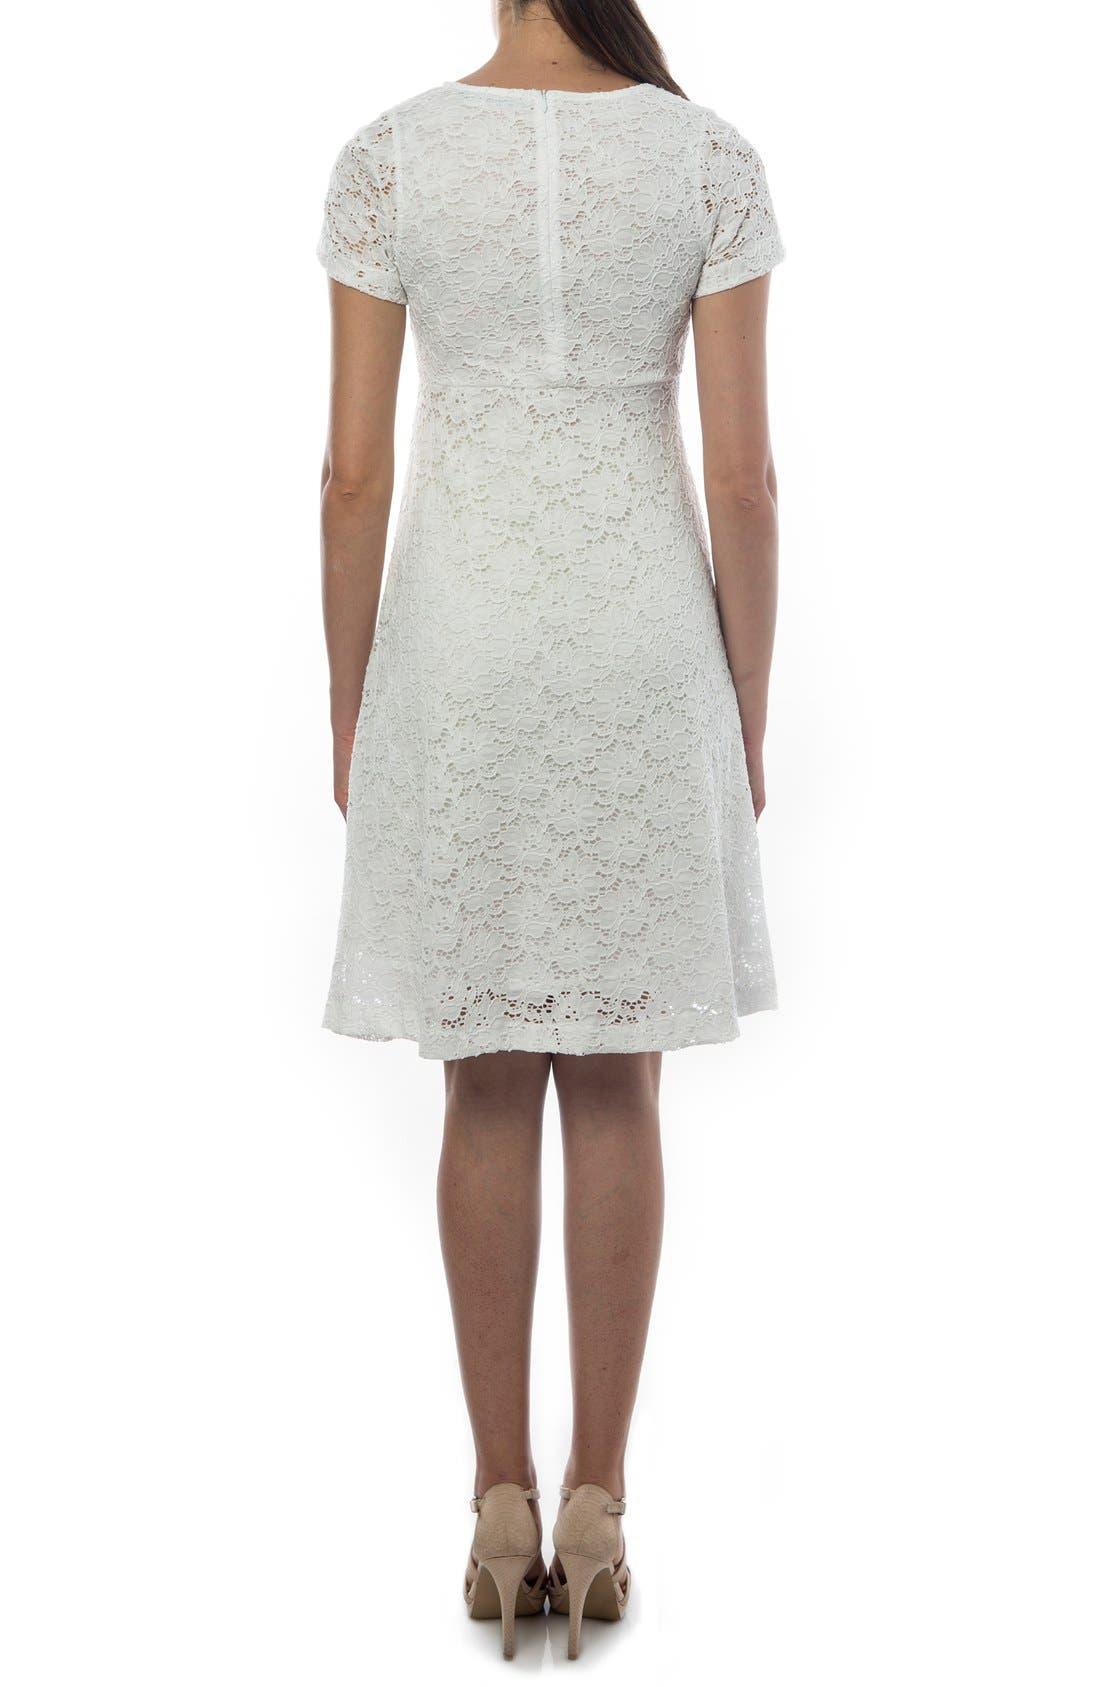 'Rodano' Lace Maternity Dress,                             Alternate thumbnail 2, color,                             101